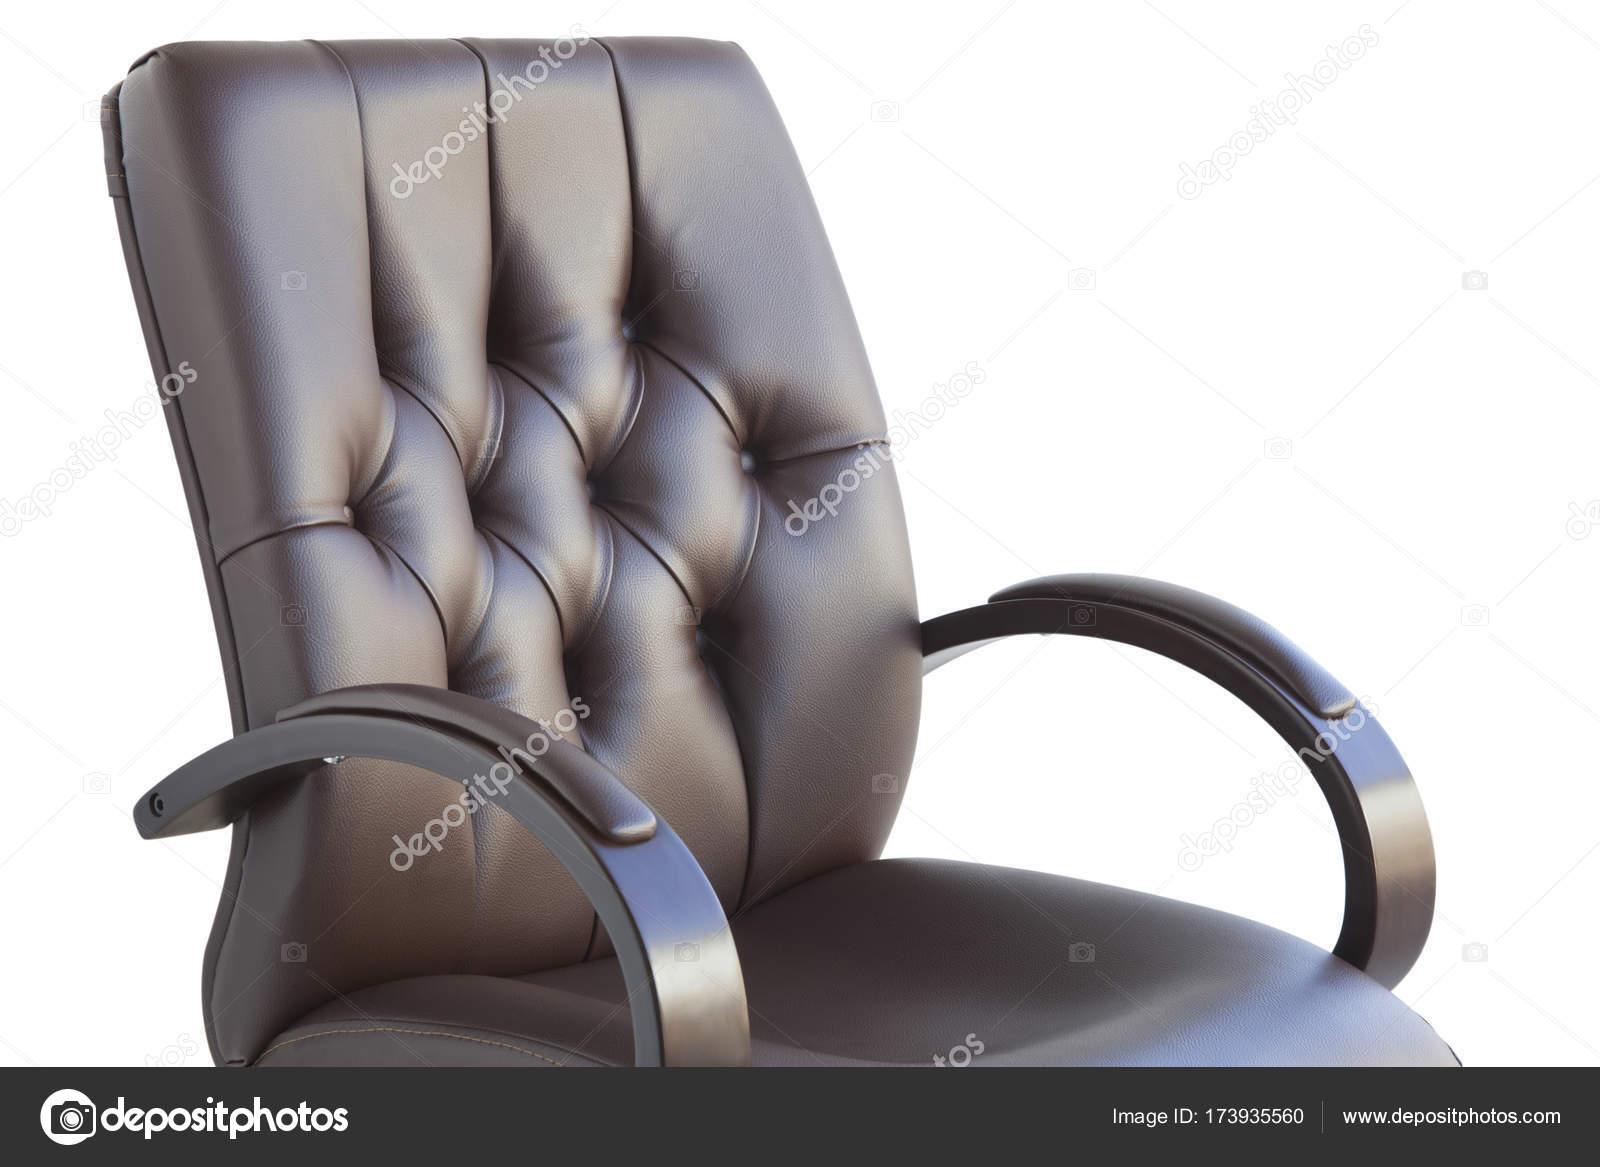 Zwarte bureau stoel achtergrond u2014 stockfoto © reflex safak #173935560